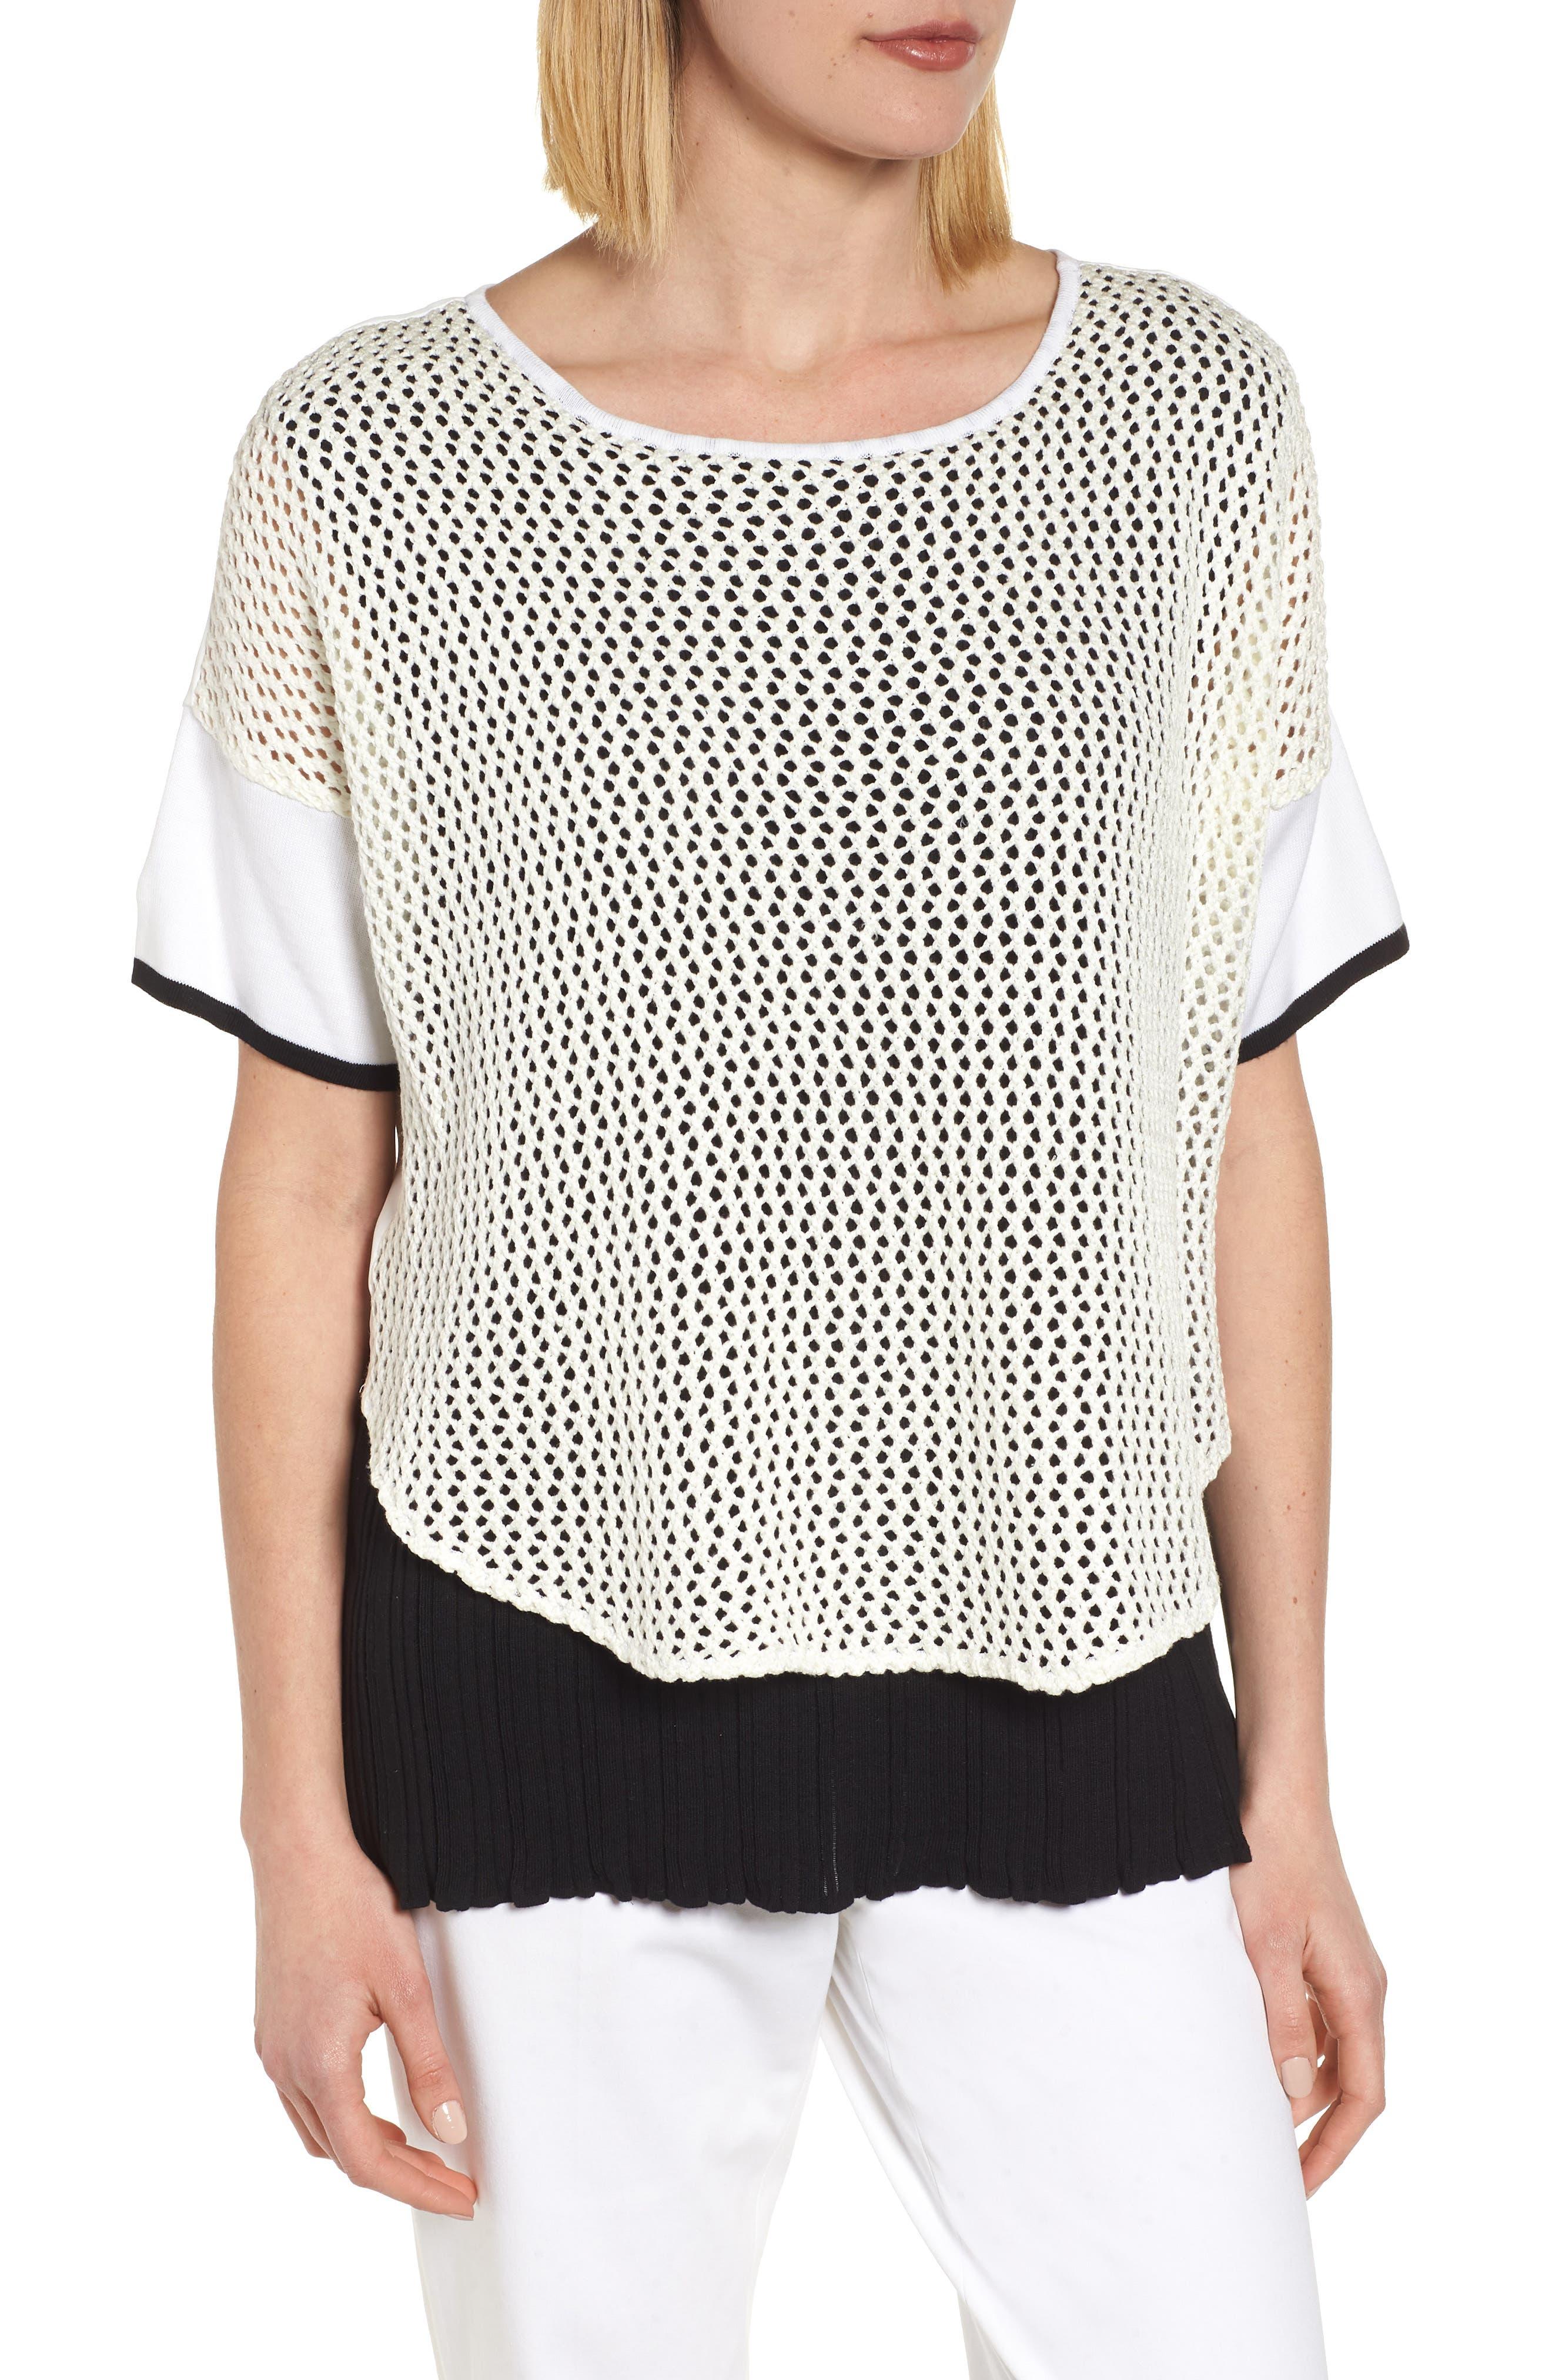 Mixed Media Short Sleeve Tunic Top,                         Main,                         color, White/ Black